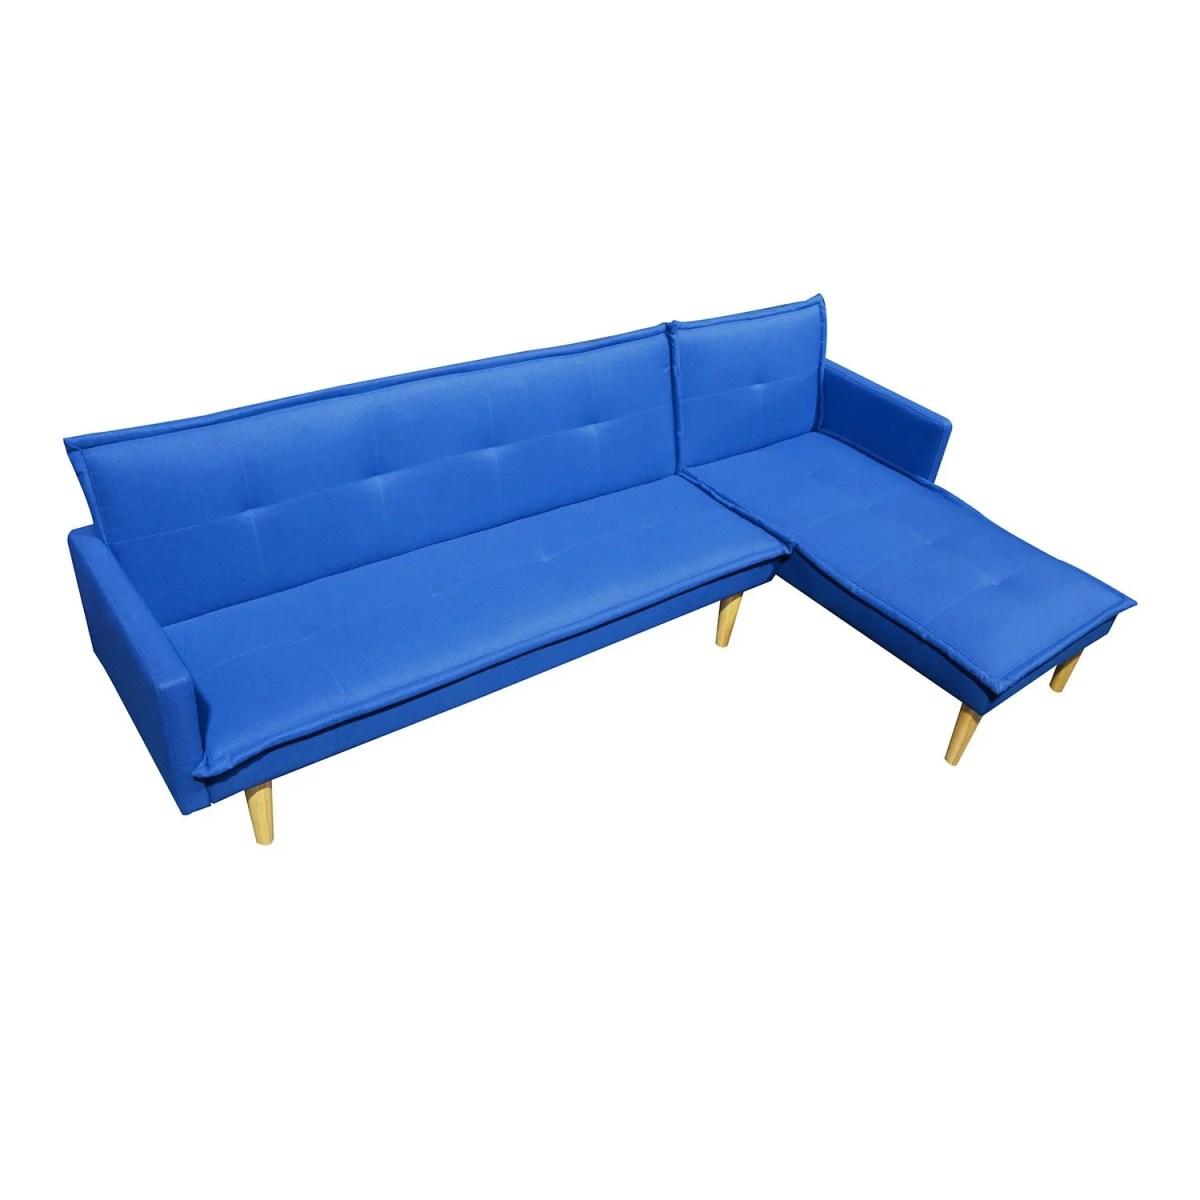 sala esquinada sofá cama independencia azul 5